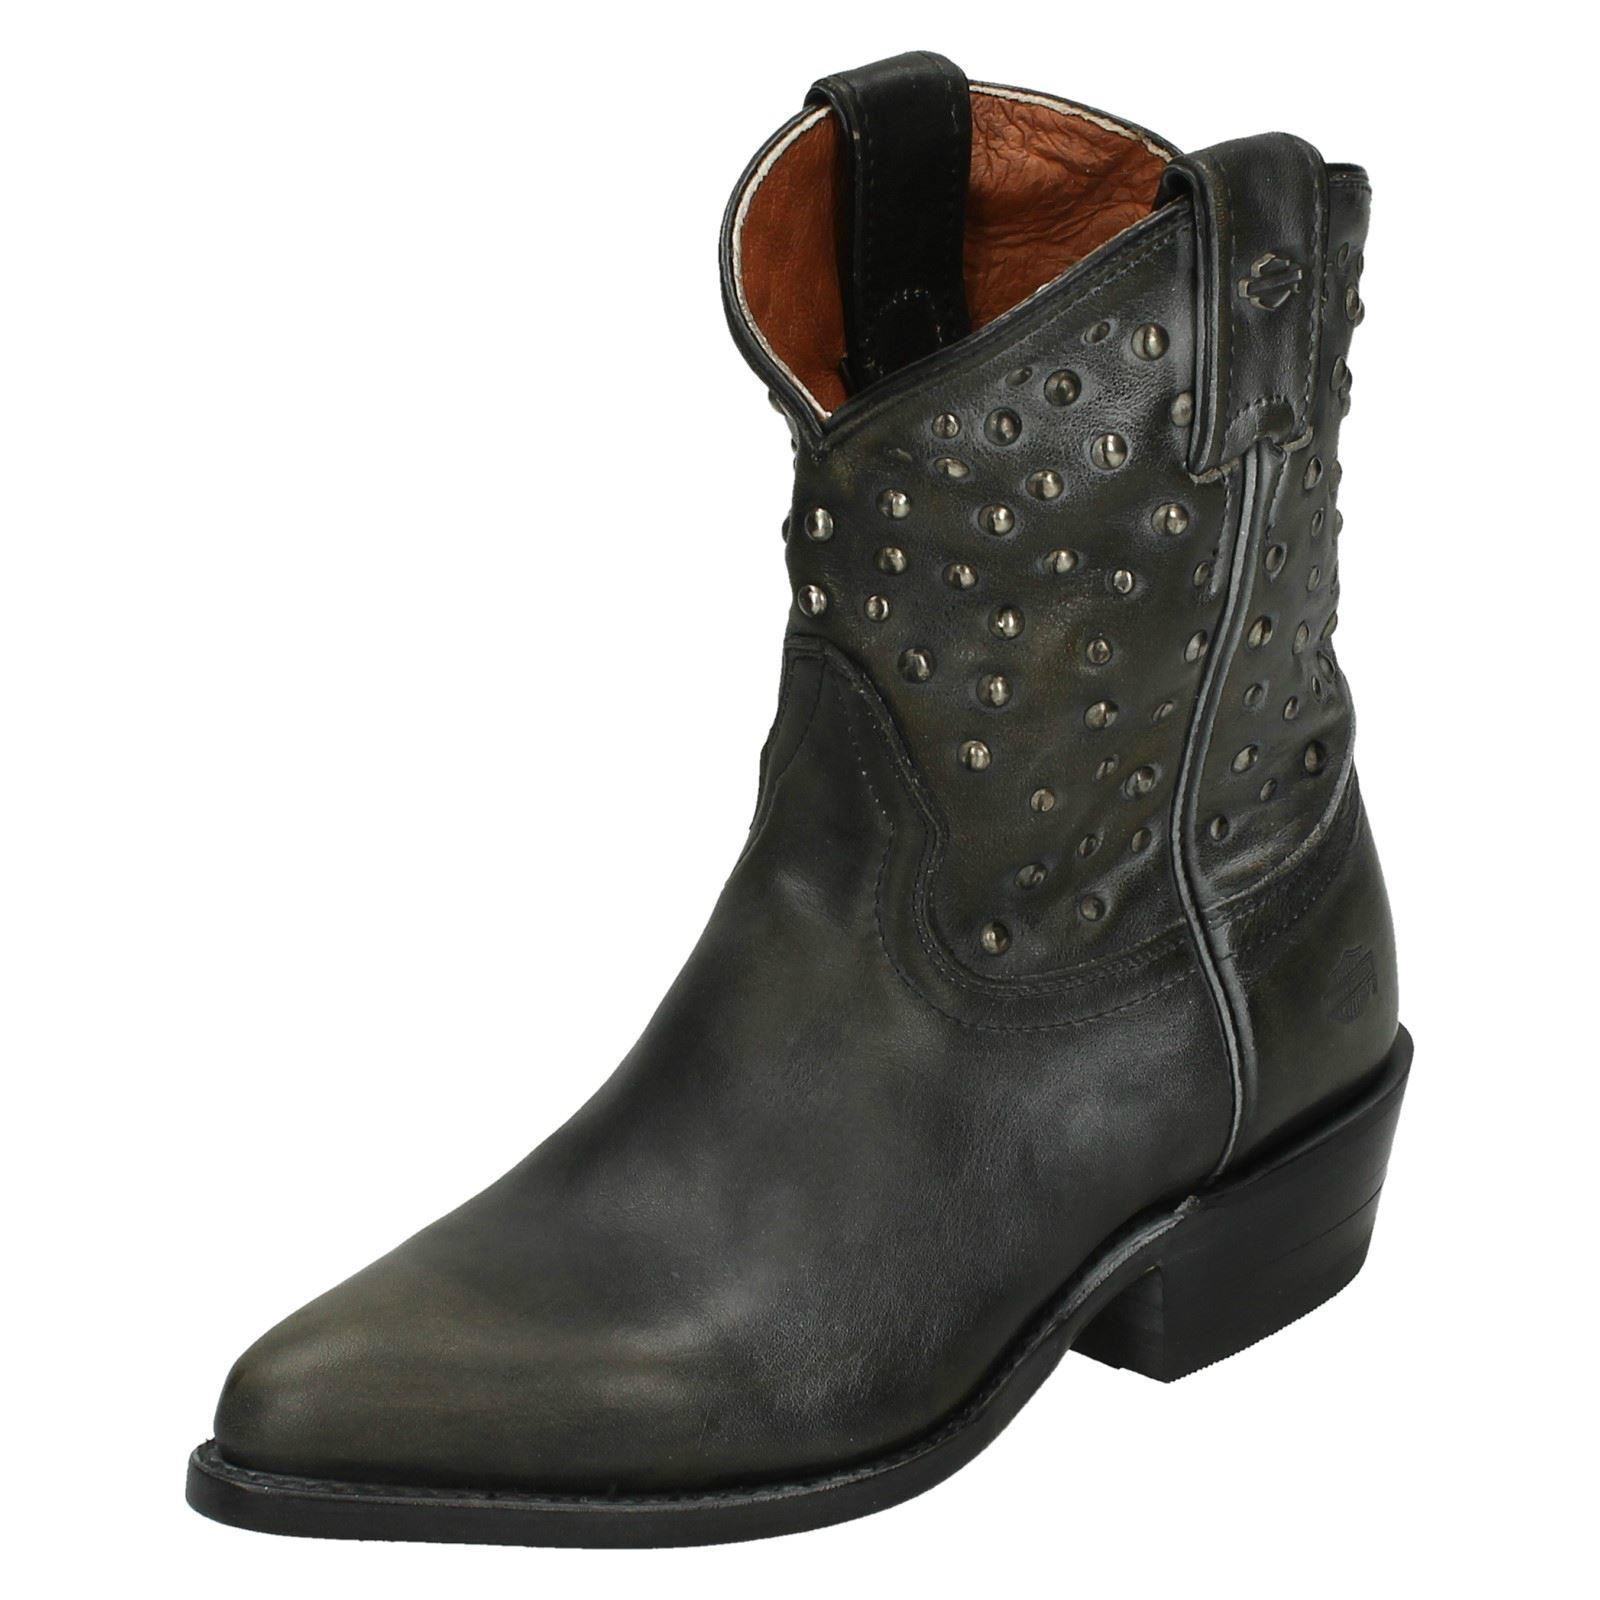 Señoras HARLEY DAVIDSON Kira Cuero Negro Tachonado Tobillo Tobillo Tobillo botas De Vaquero  ventas en linea